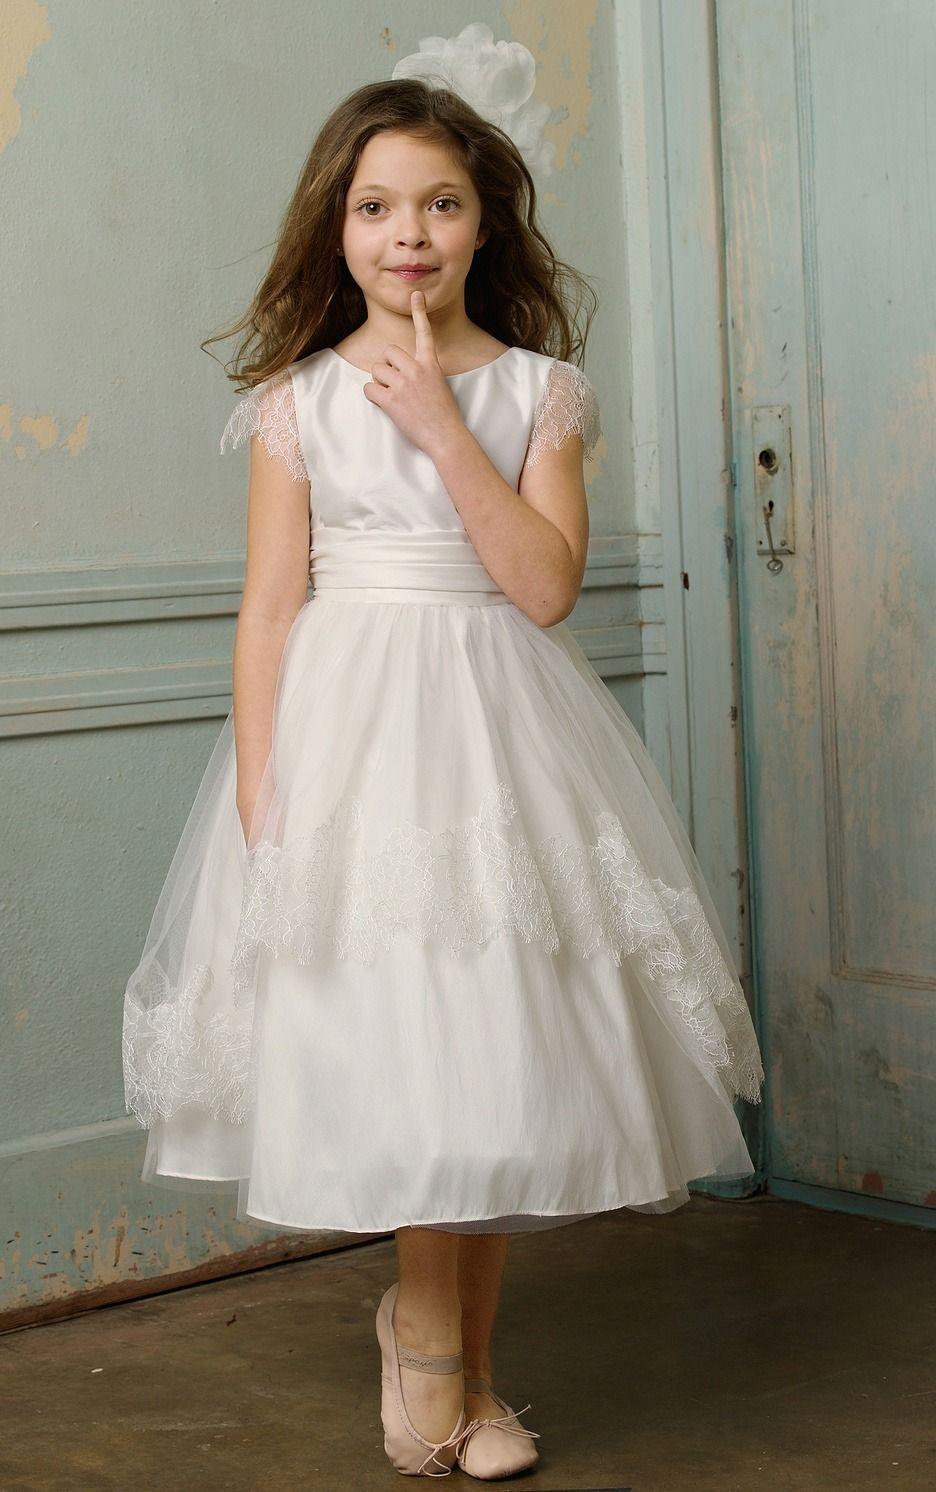 Bridesmaid dresseslovely bridesmaid dressessmart taffeta natural